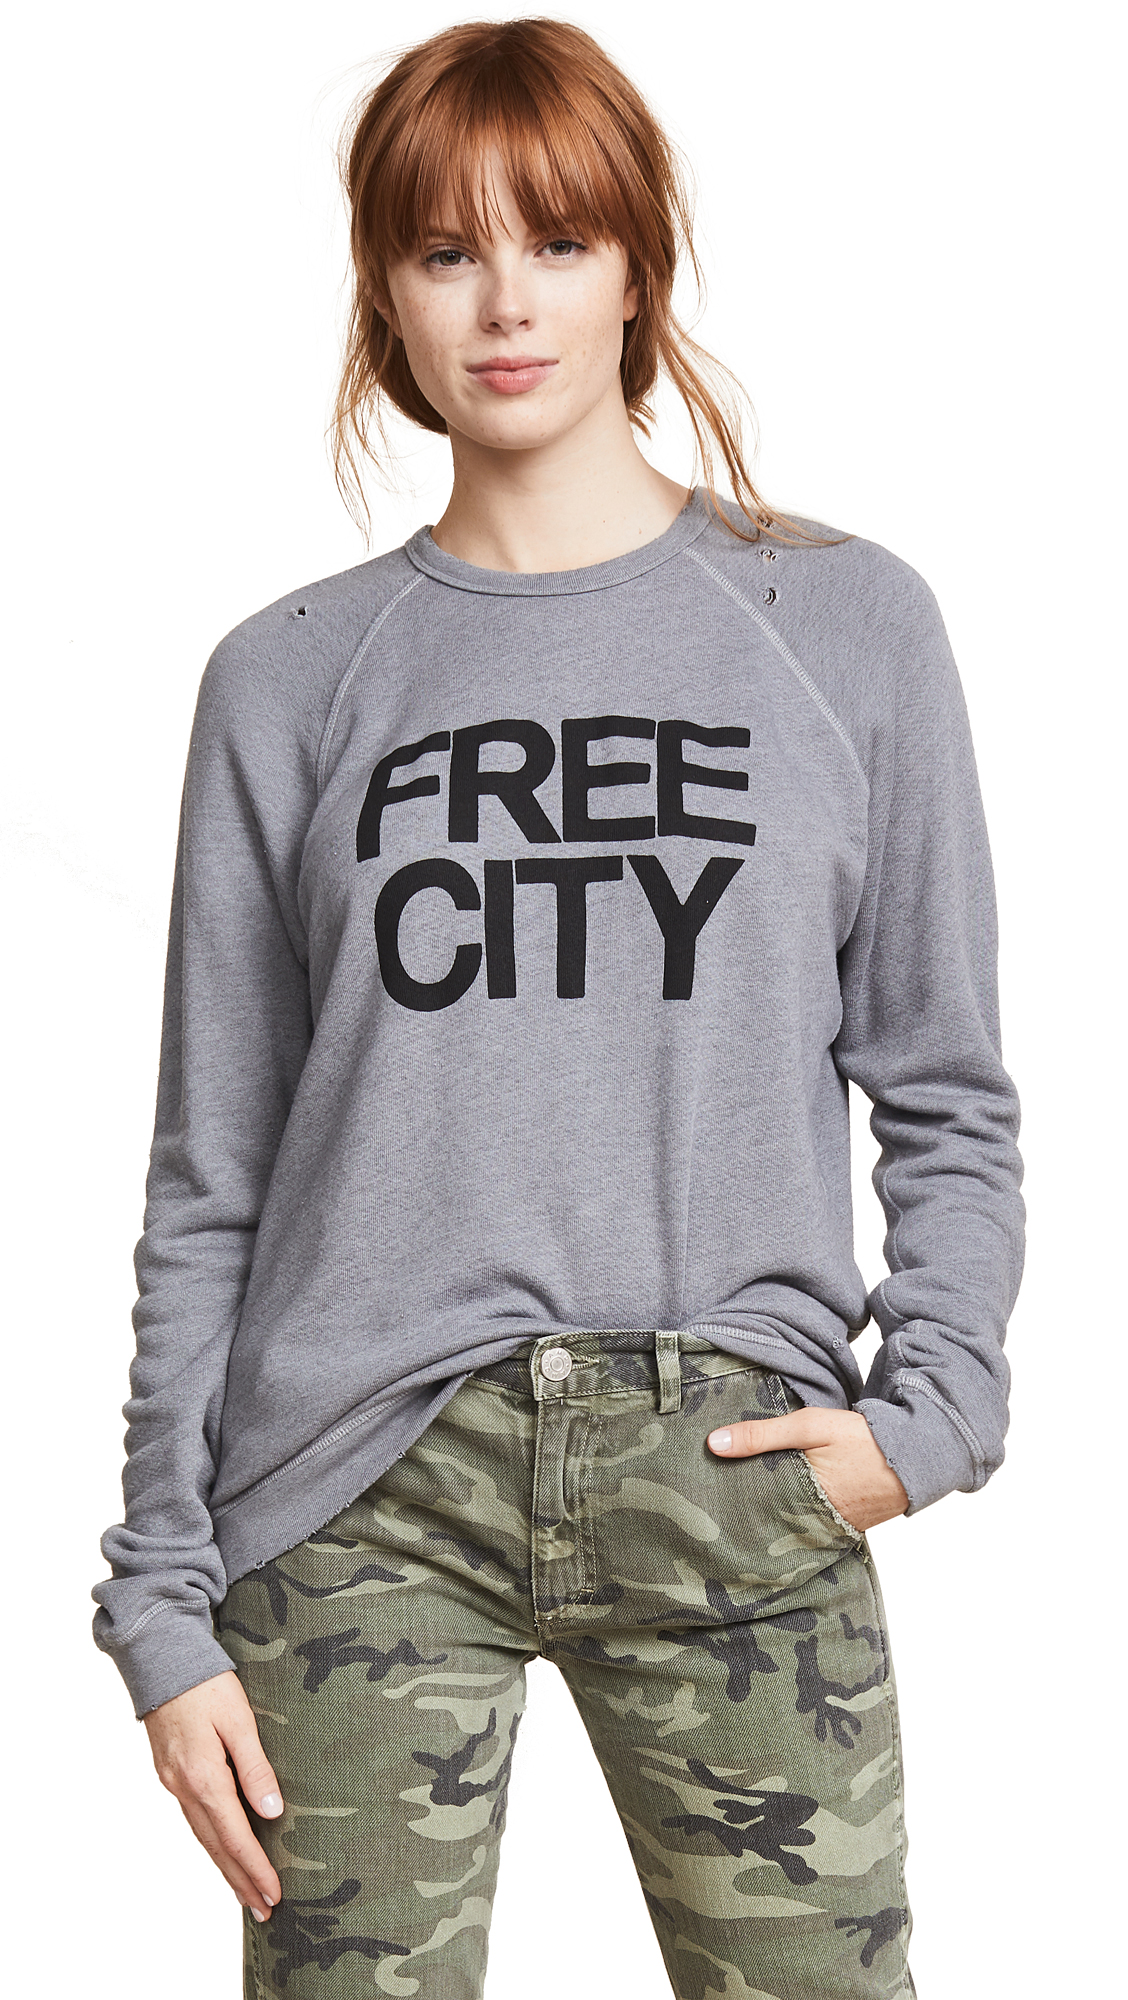 FREECITY Super Thrash Destroy Sweatshirt In Destroy Heather